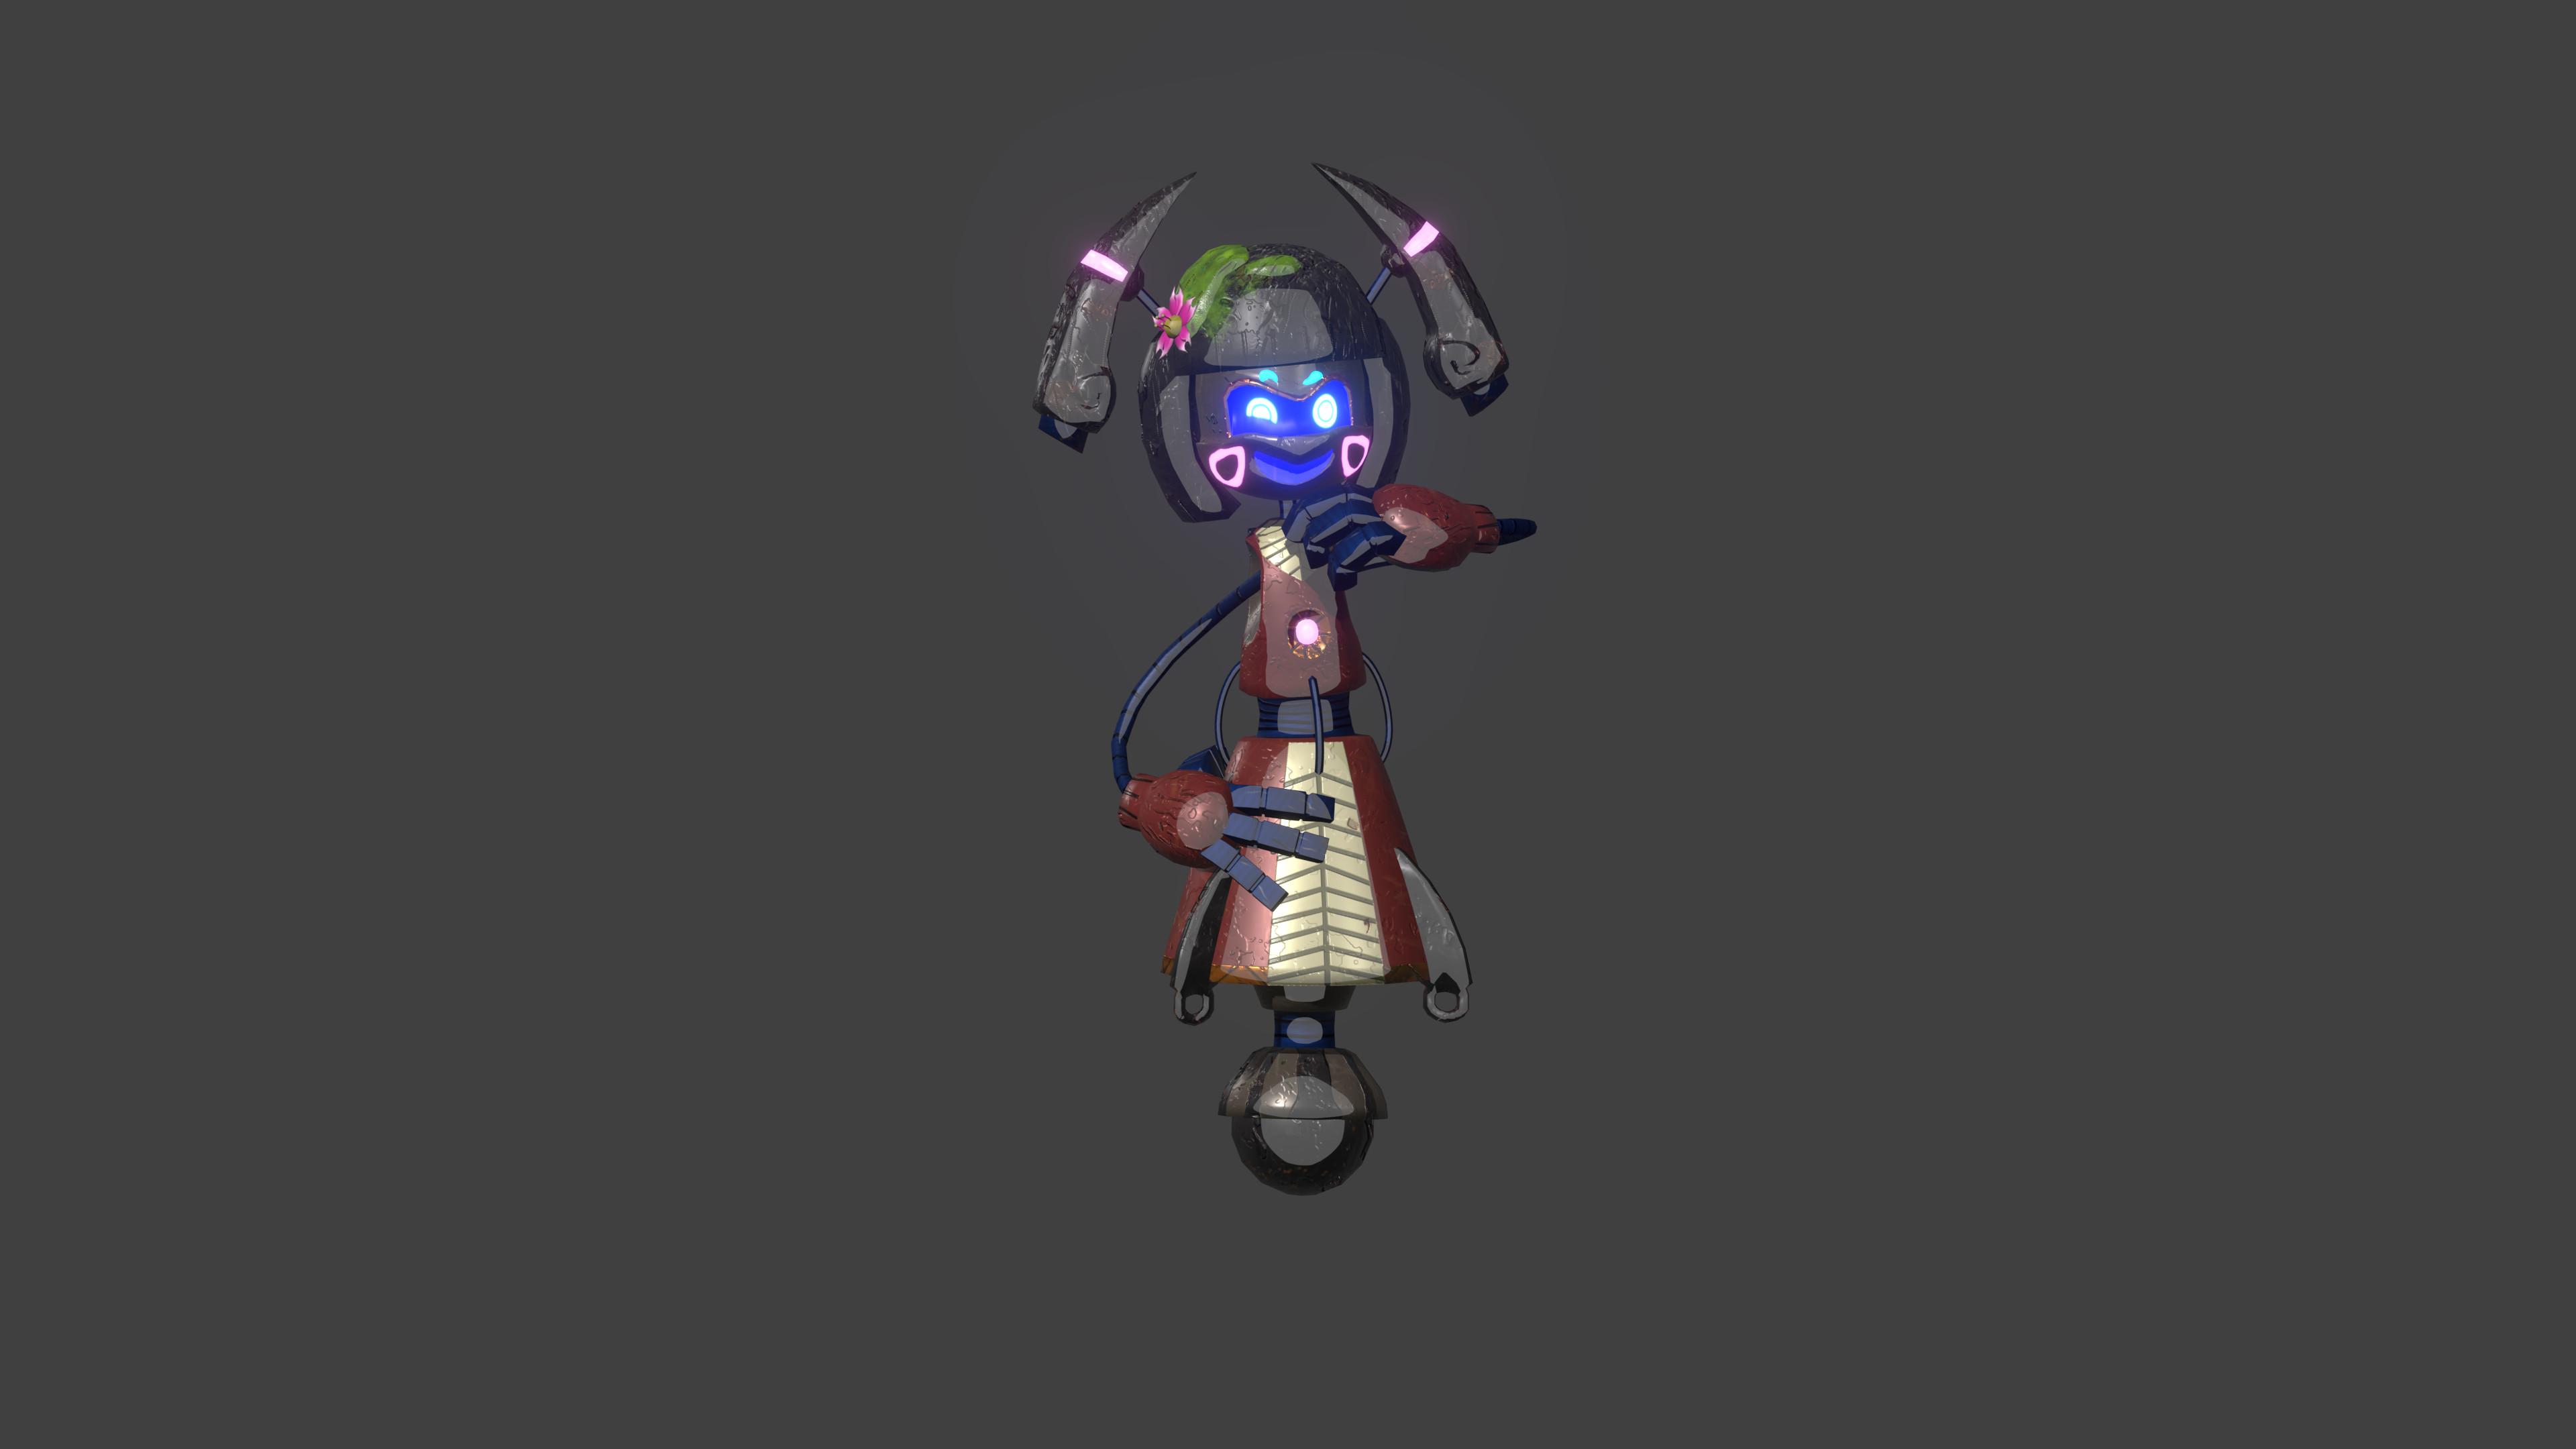 Dokkan, Edison's tiny kokeshi doll robot partner